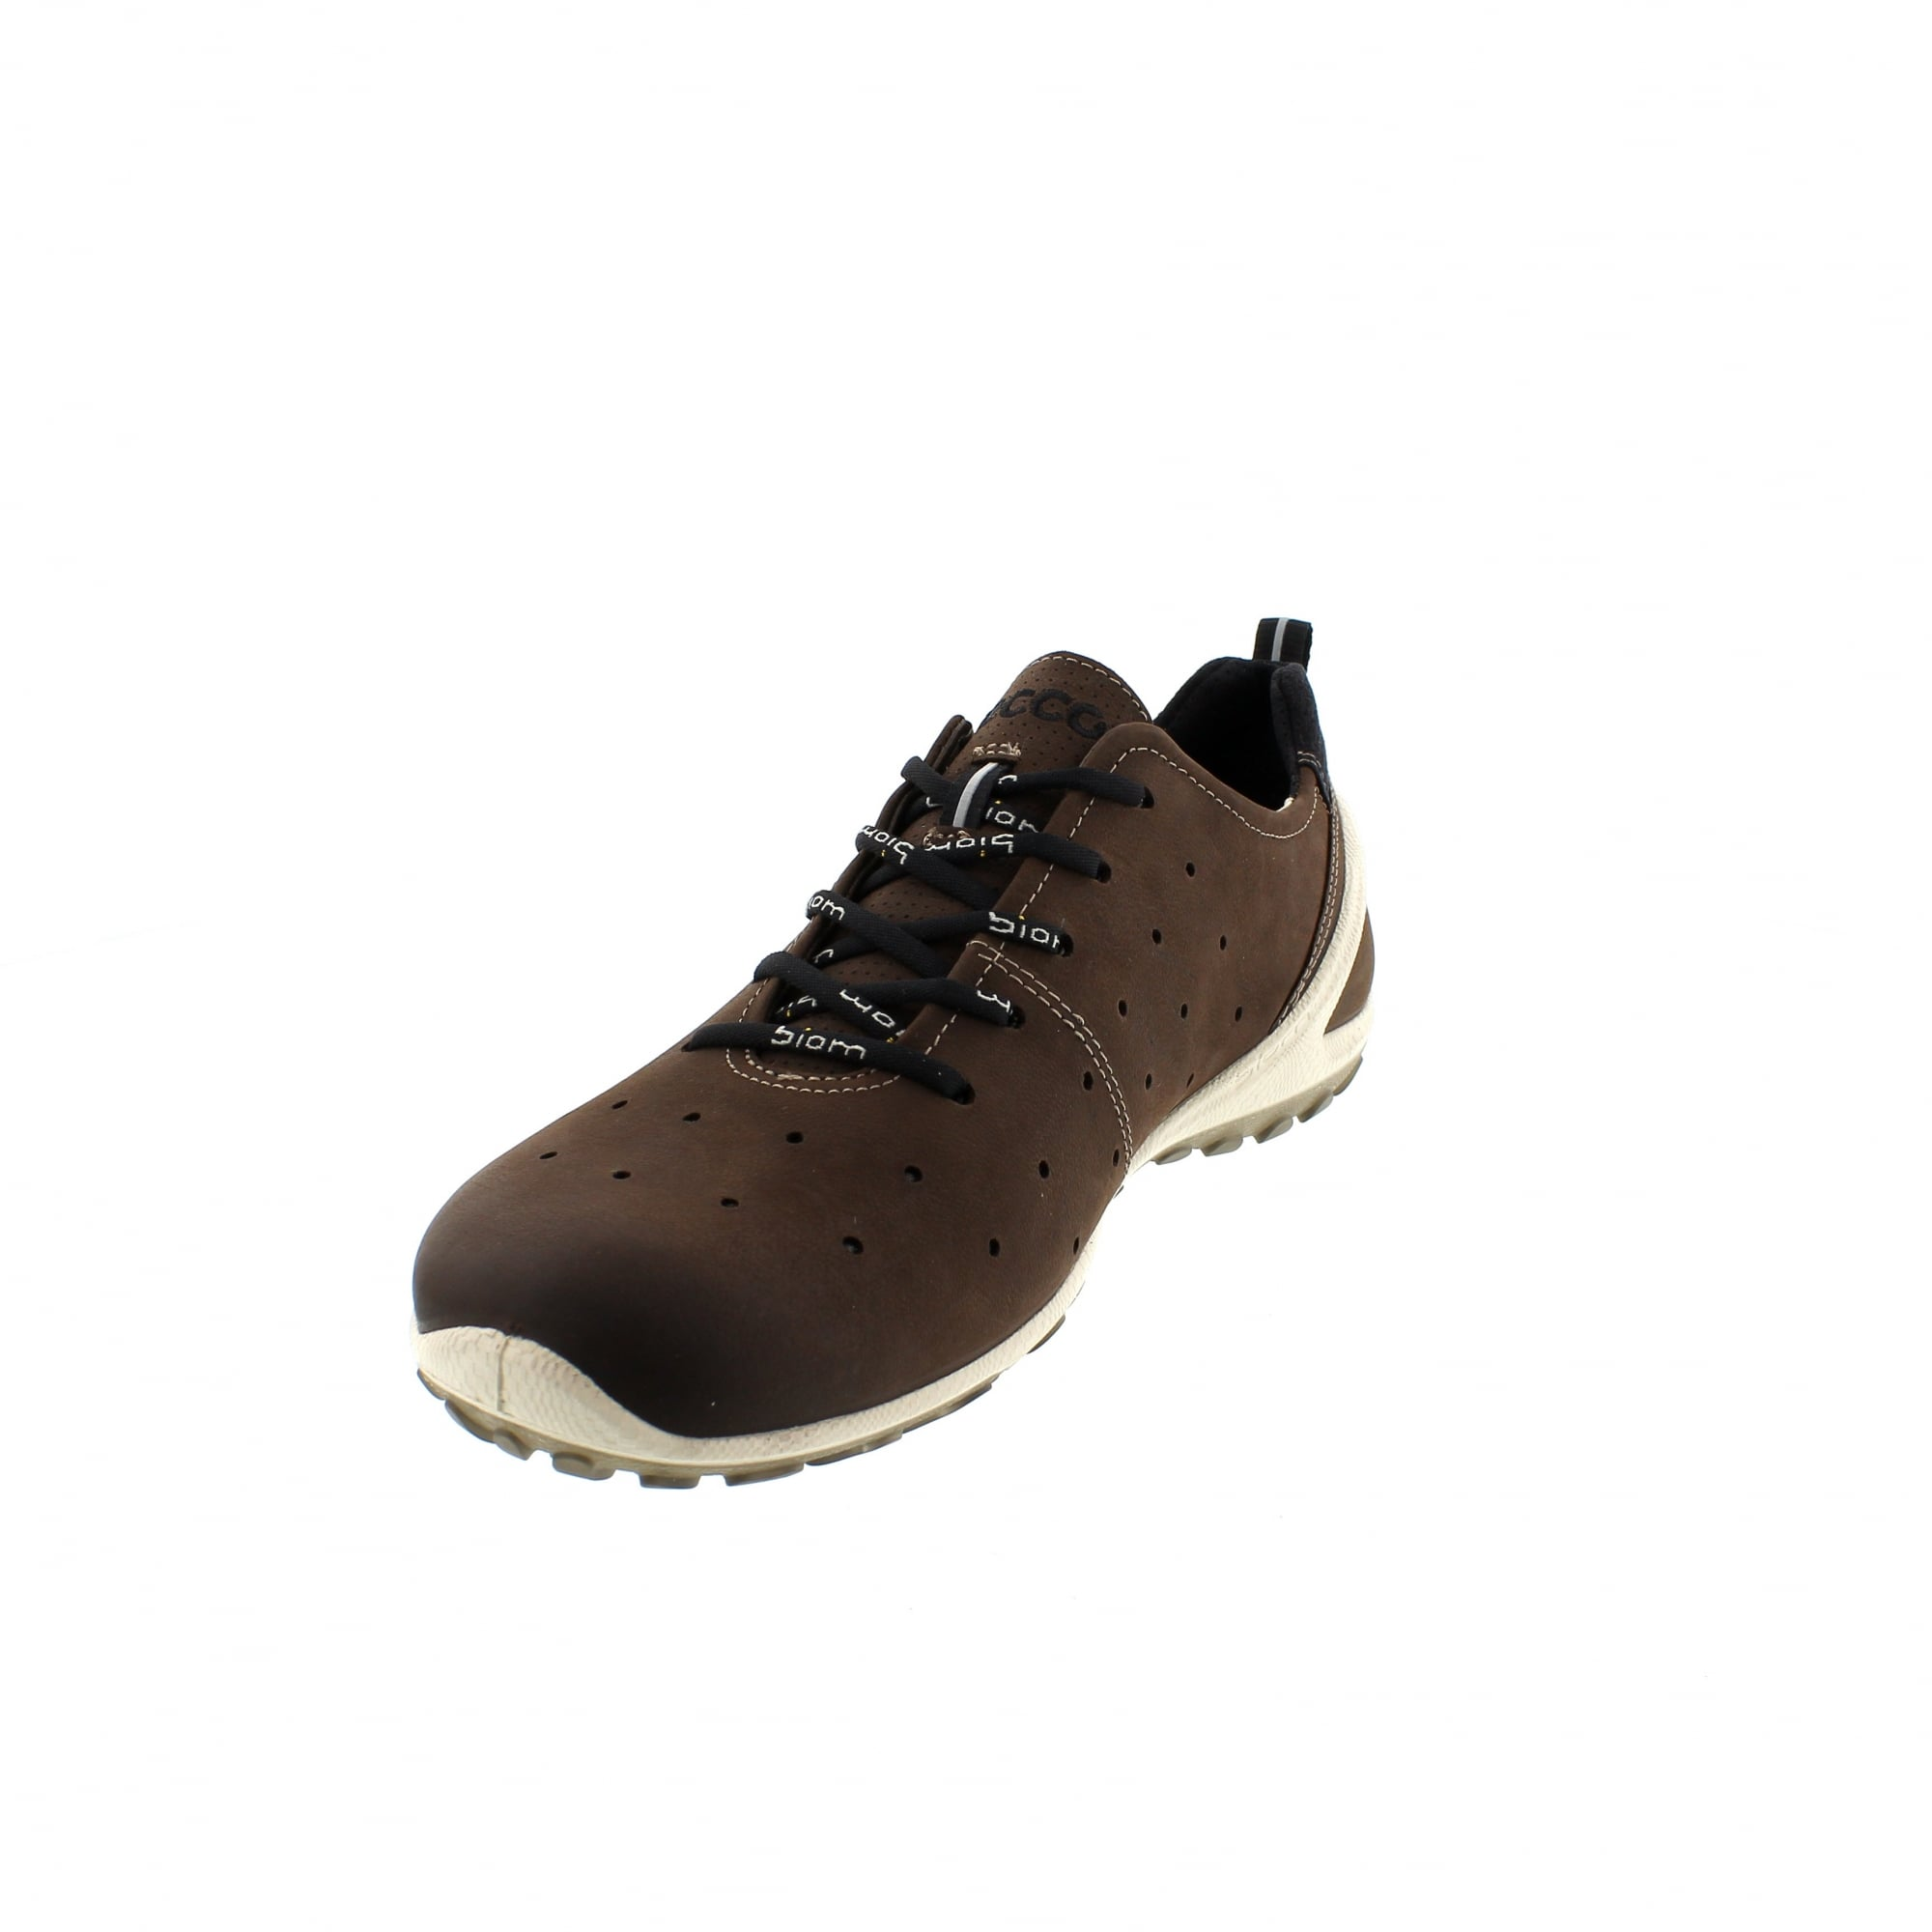 ostaa tyylikkäät kengät urheilukengät Ecco Biom Lite | 802004-51869 - Mens from Rogerson Shoes UK